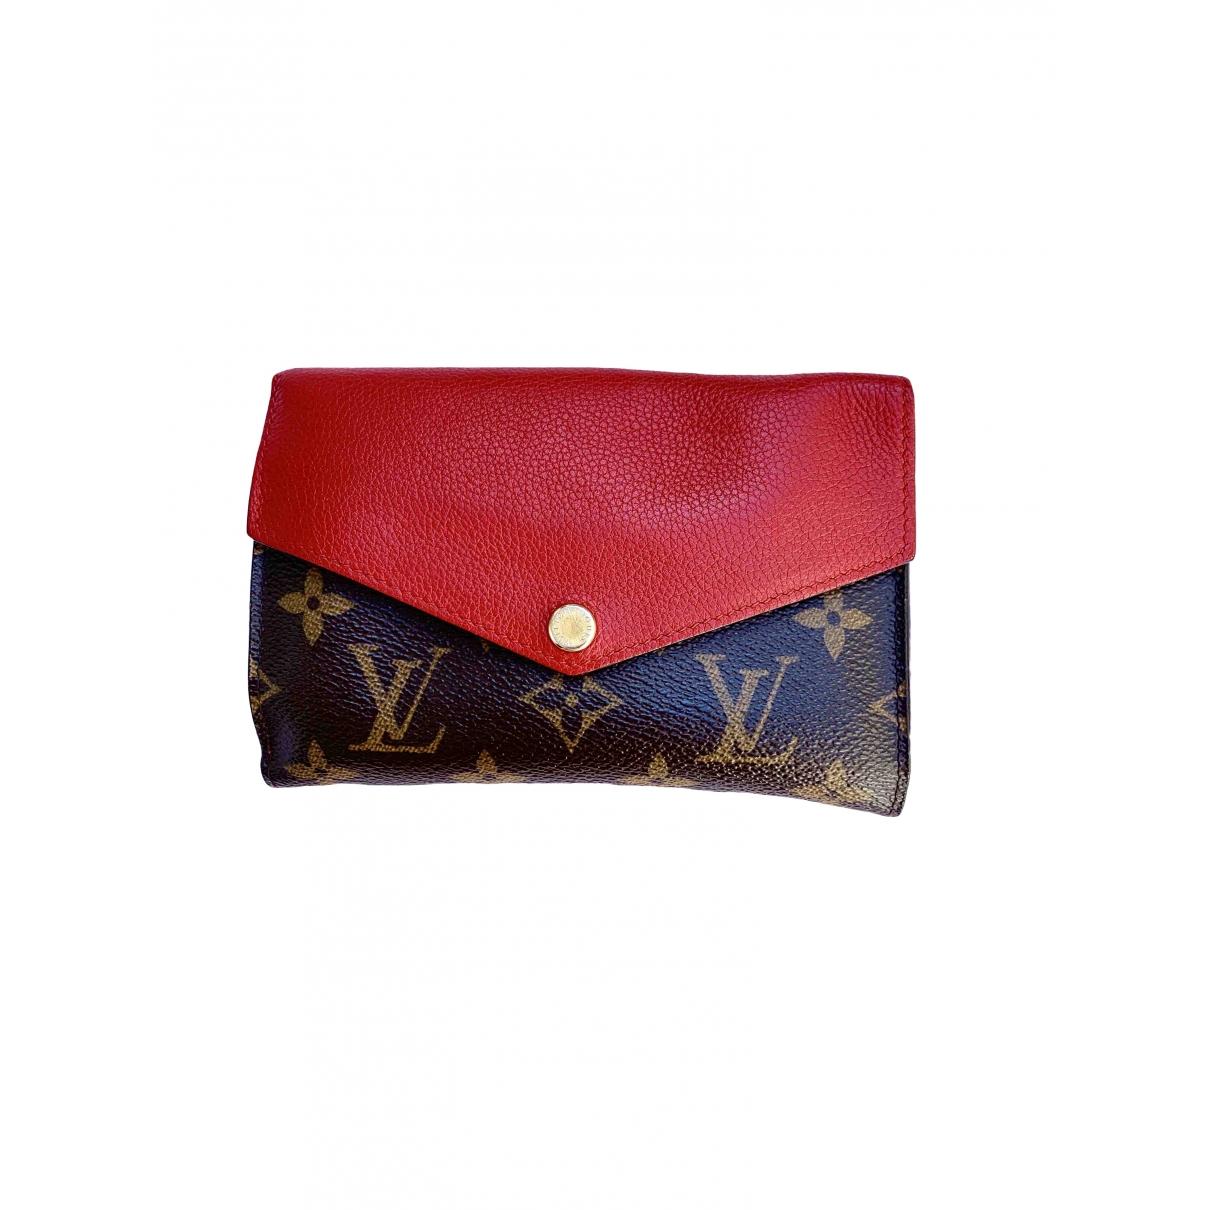 Louis Vuitton \N Portemonnaie in  Rot Leinen